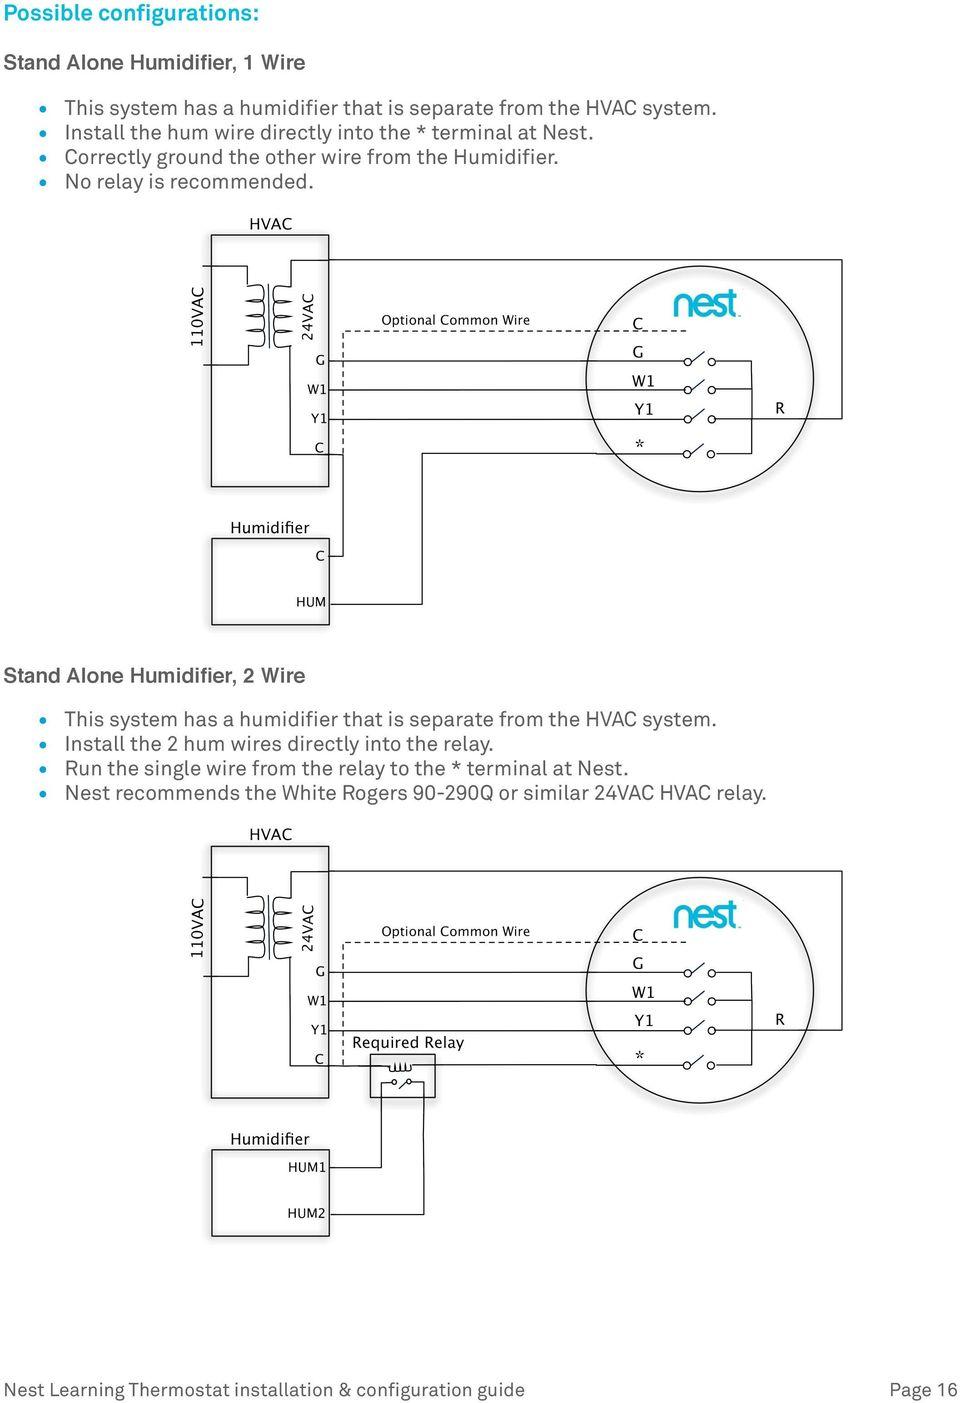 BZ_3279] White Rodgers Wiring Diagram Advanced Get Free Image About Wiring  Schematic Wiring | White Rodgers Wiring Diagram Advanced |  | Socad Alma Adit Gue45 Mohammedshrine Librar Wiring 101